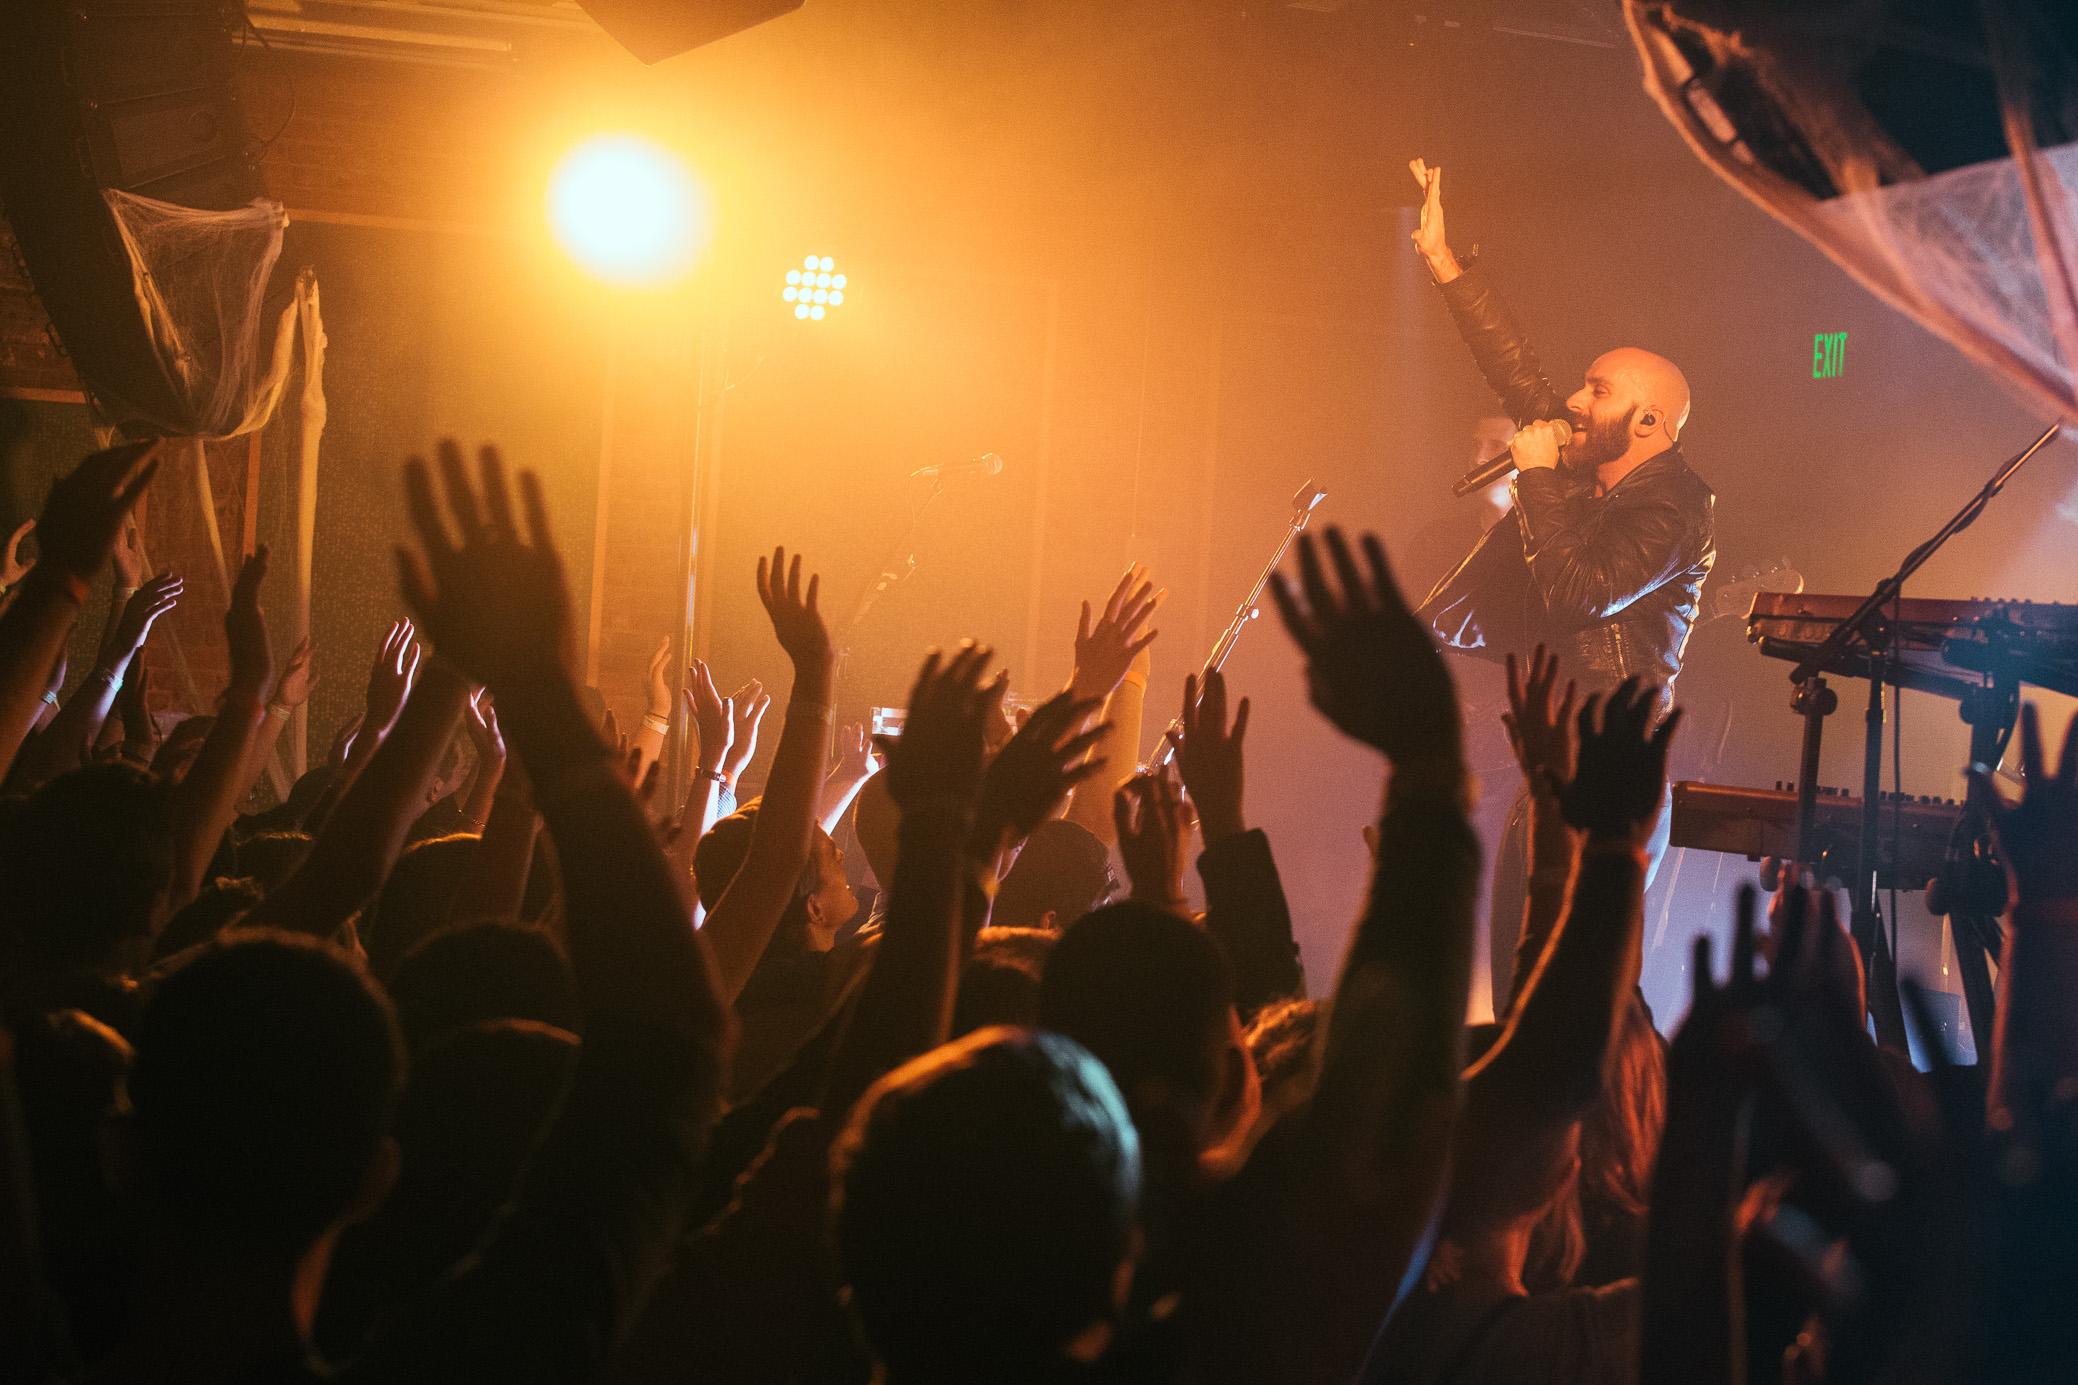 X Ambassadors perform at   Saturn Birmingham in Birmingham, Alabama on October 30th, 2015.   (Photo by David A. Smith/DSmithScenes)